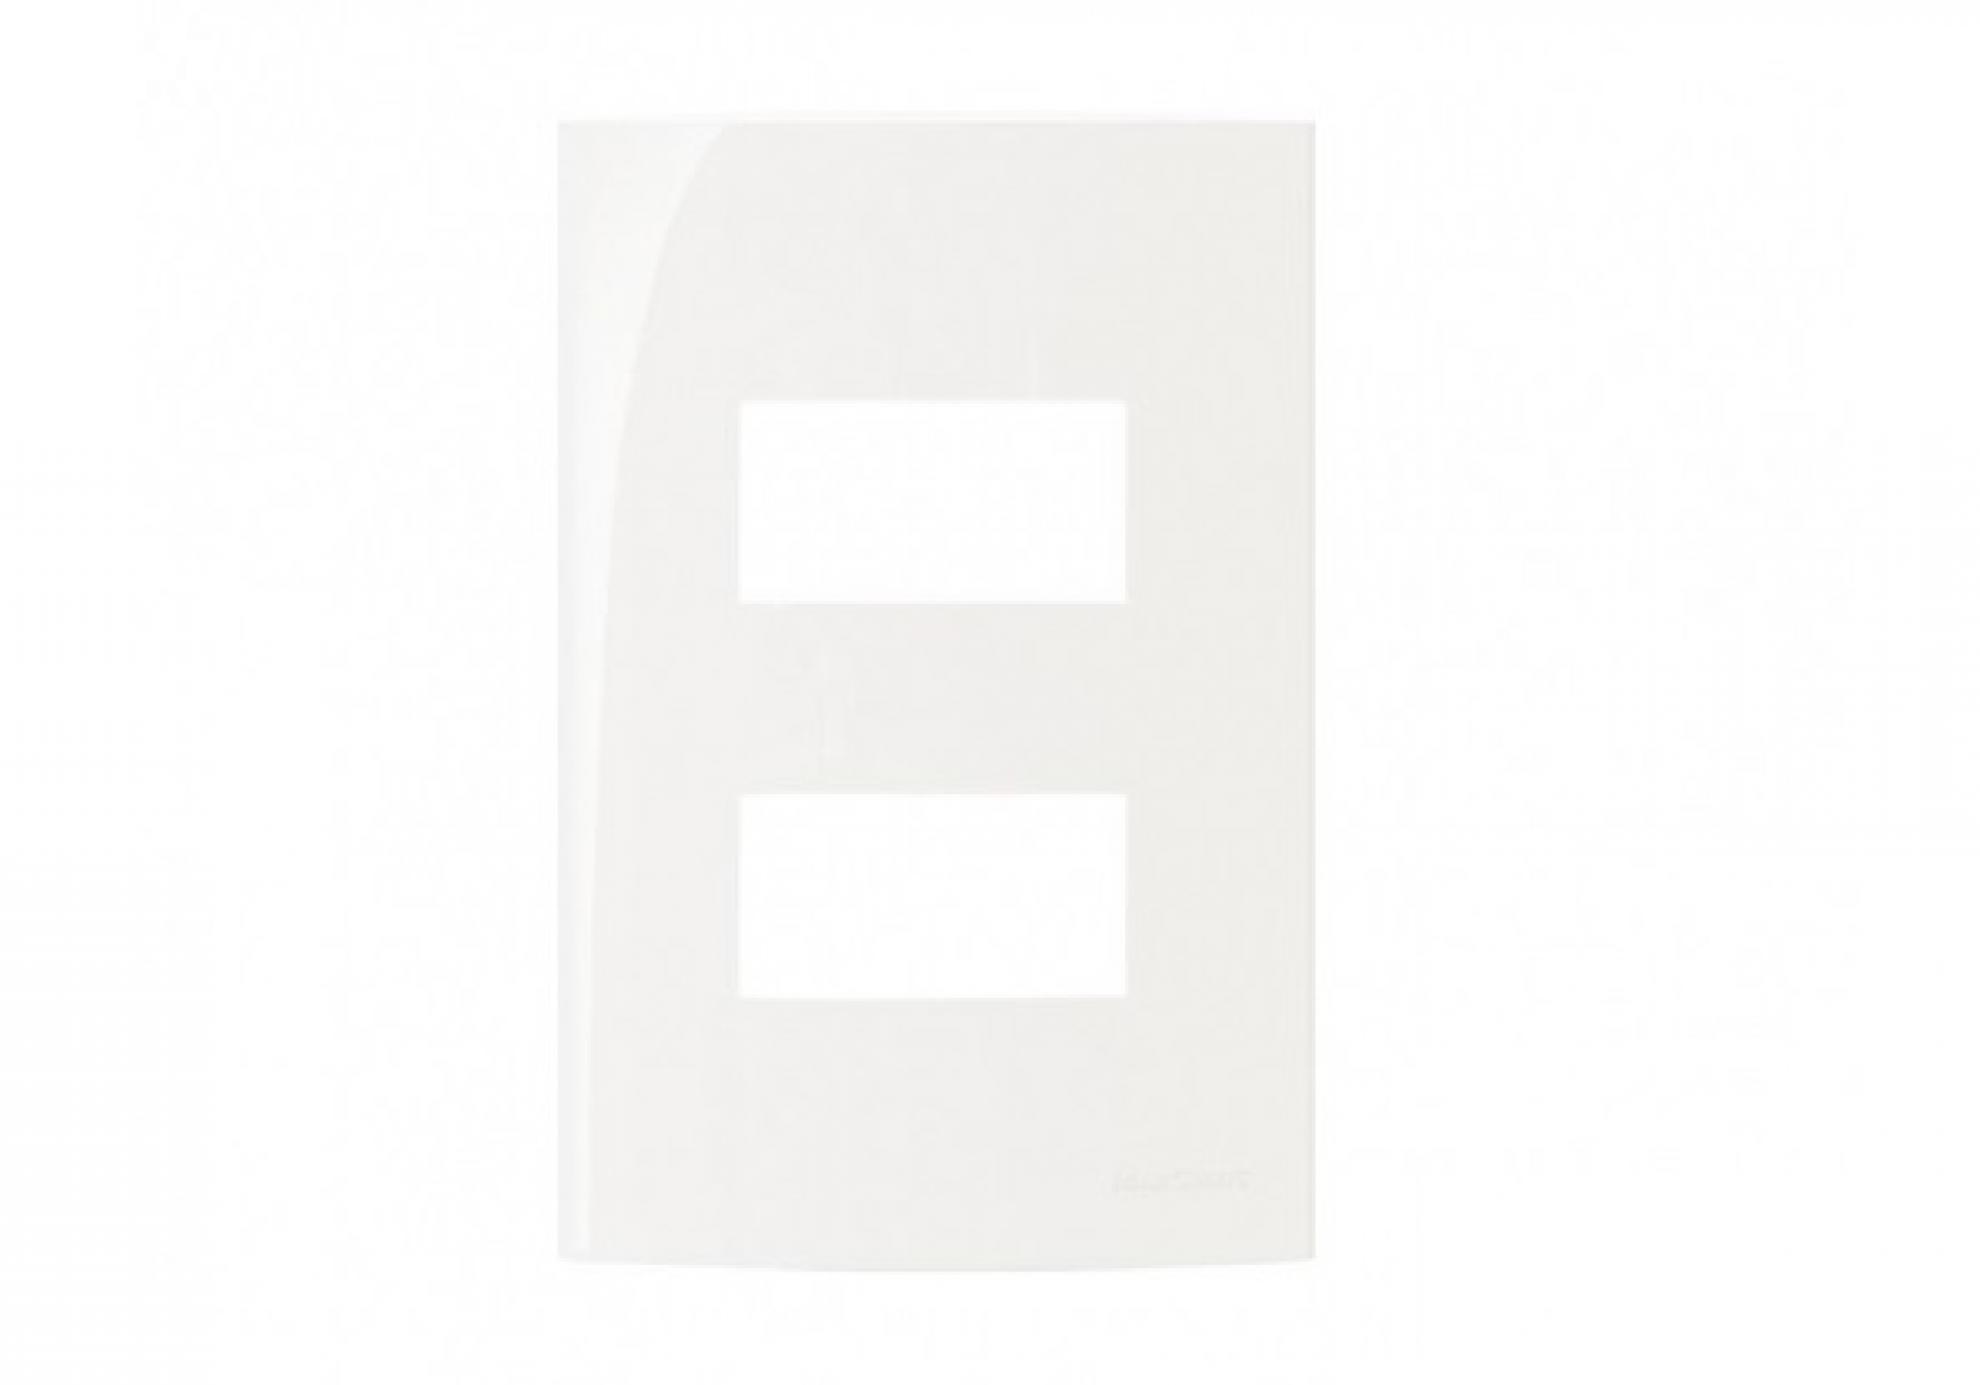 Placa 4X2 2 Postos Separados - Branco